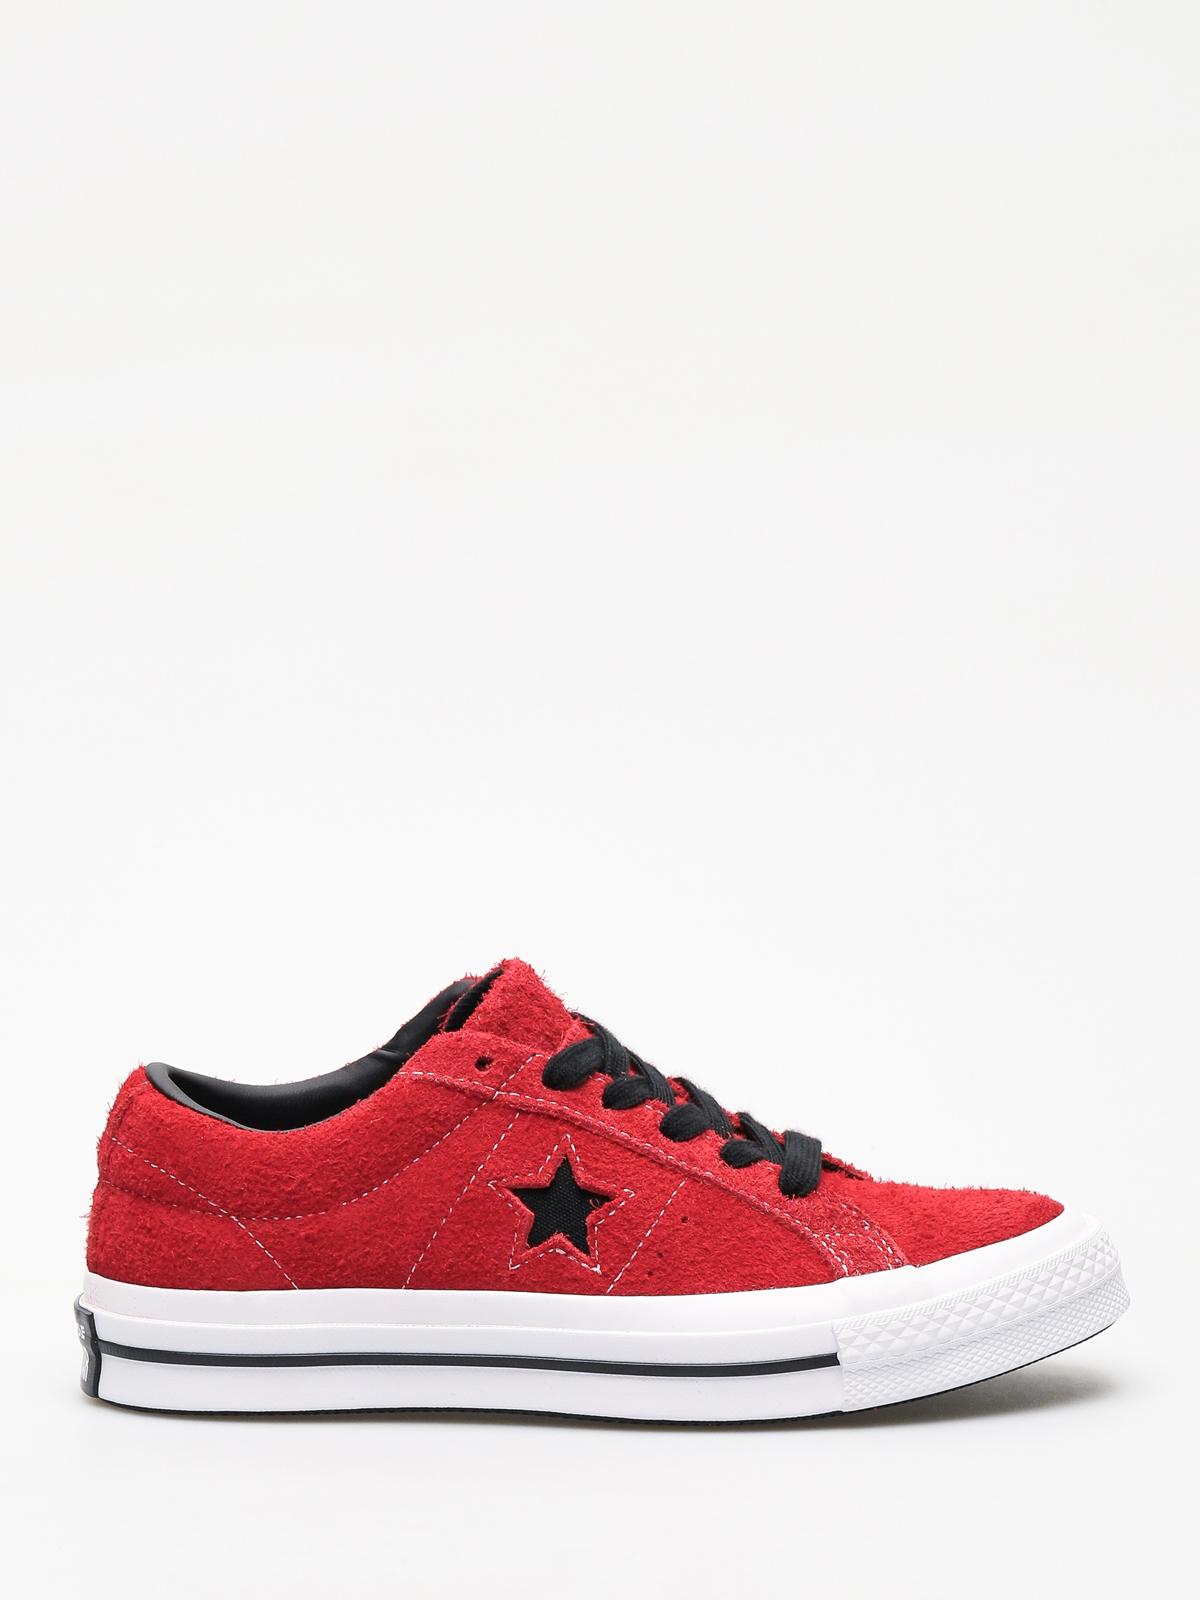 Converse One Star Ox Chucks (enamel red